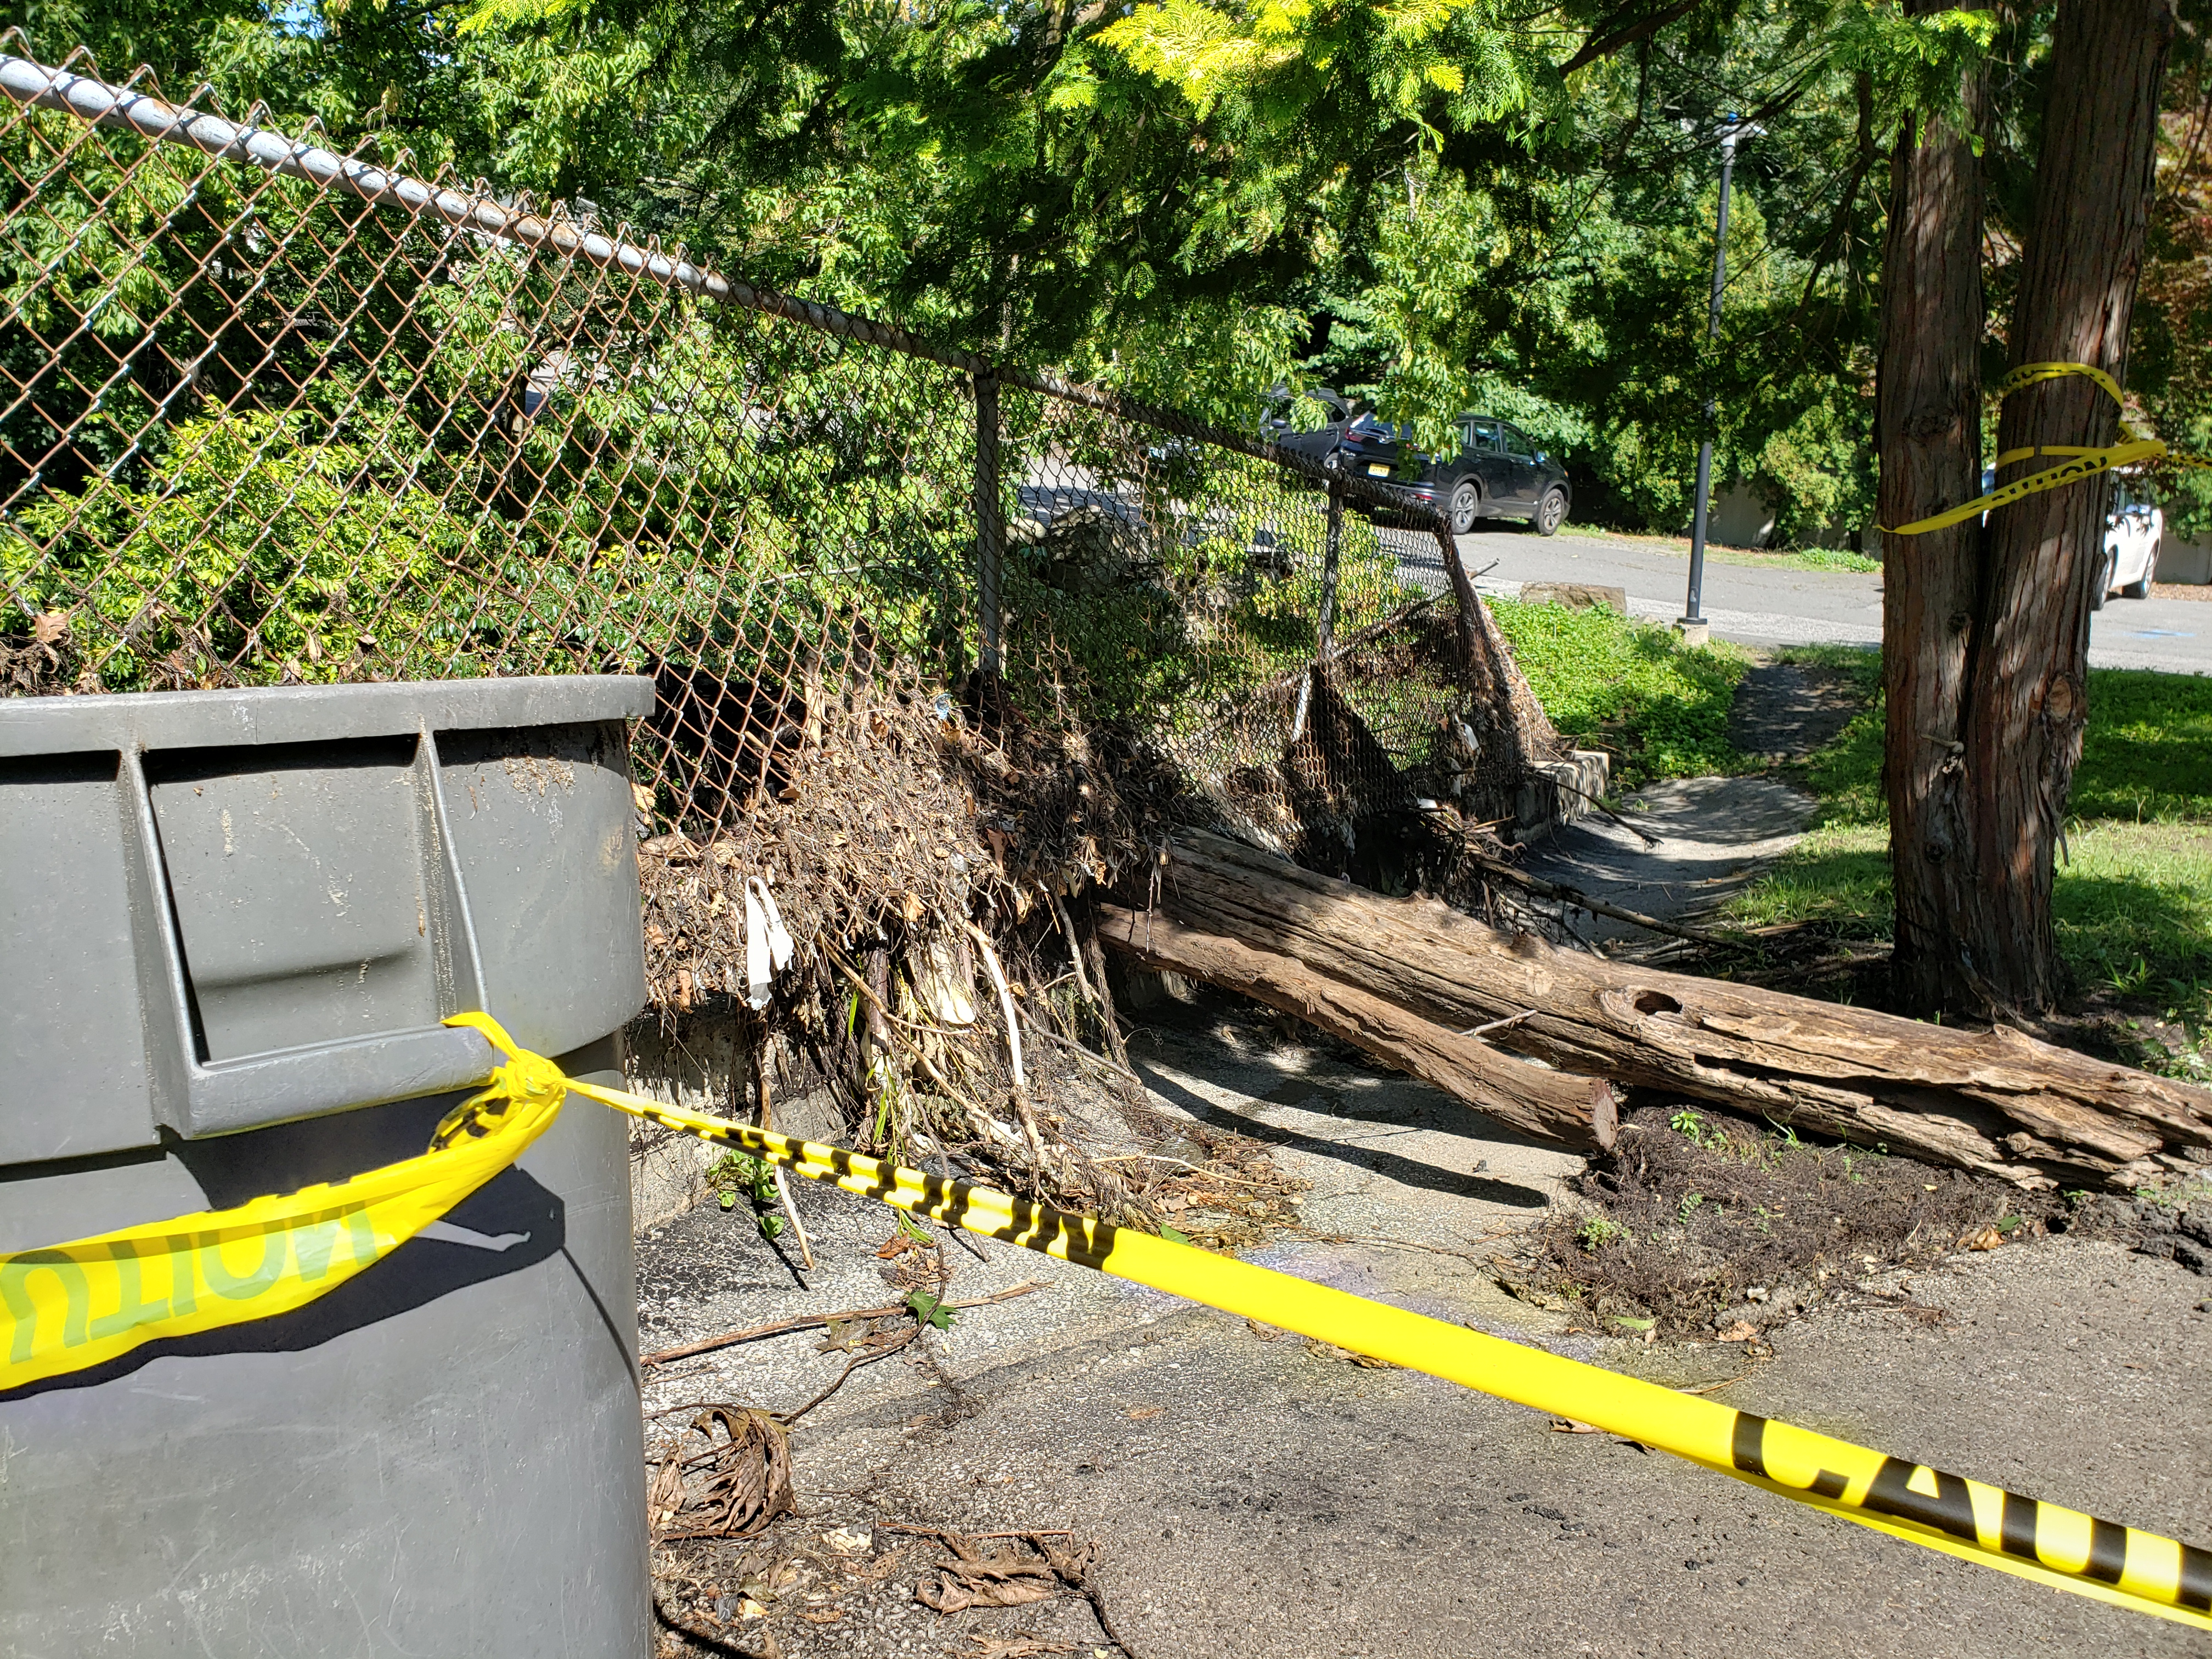 Tree crashes through fencing